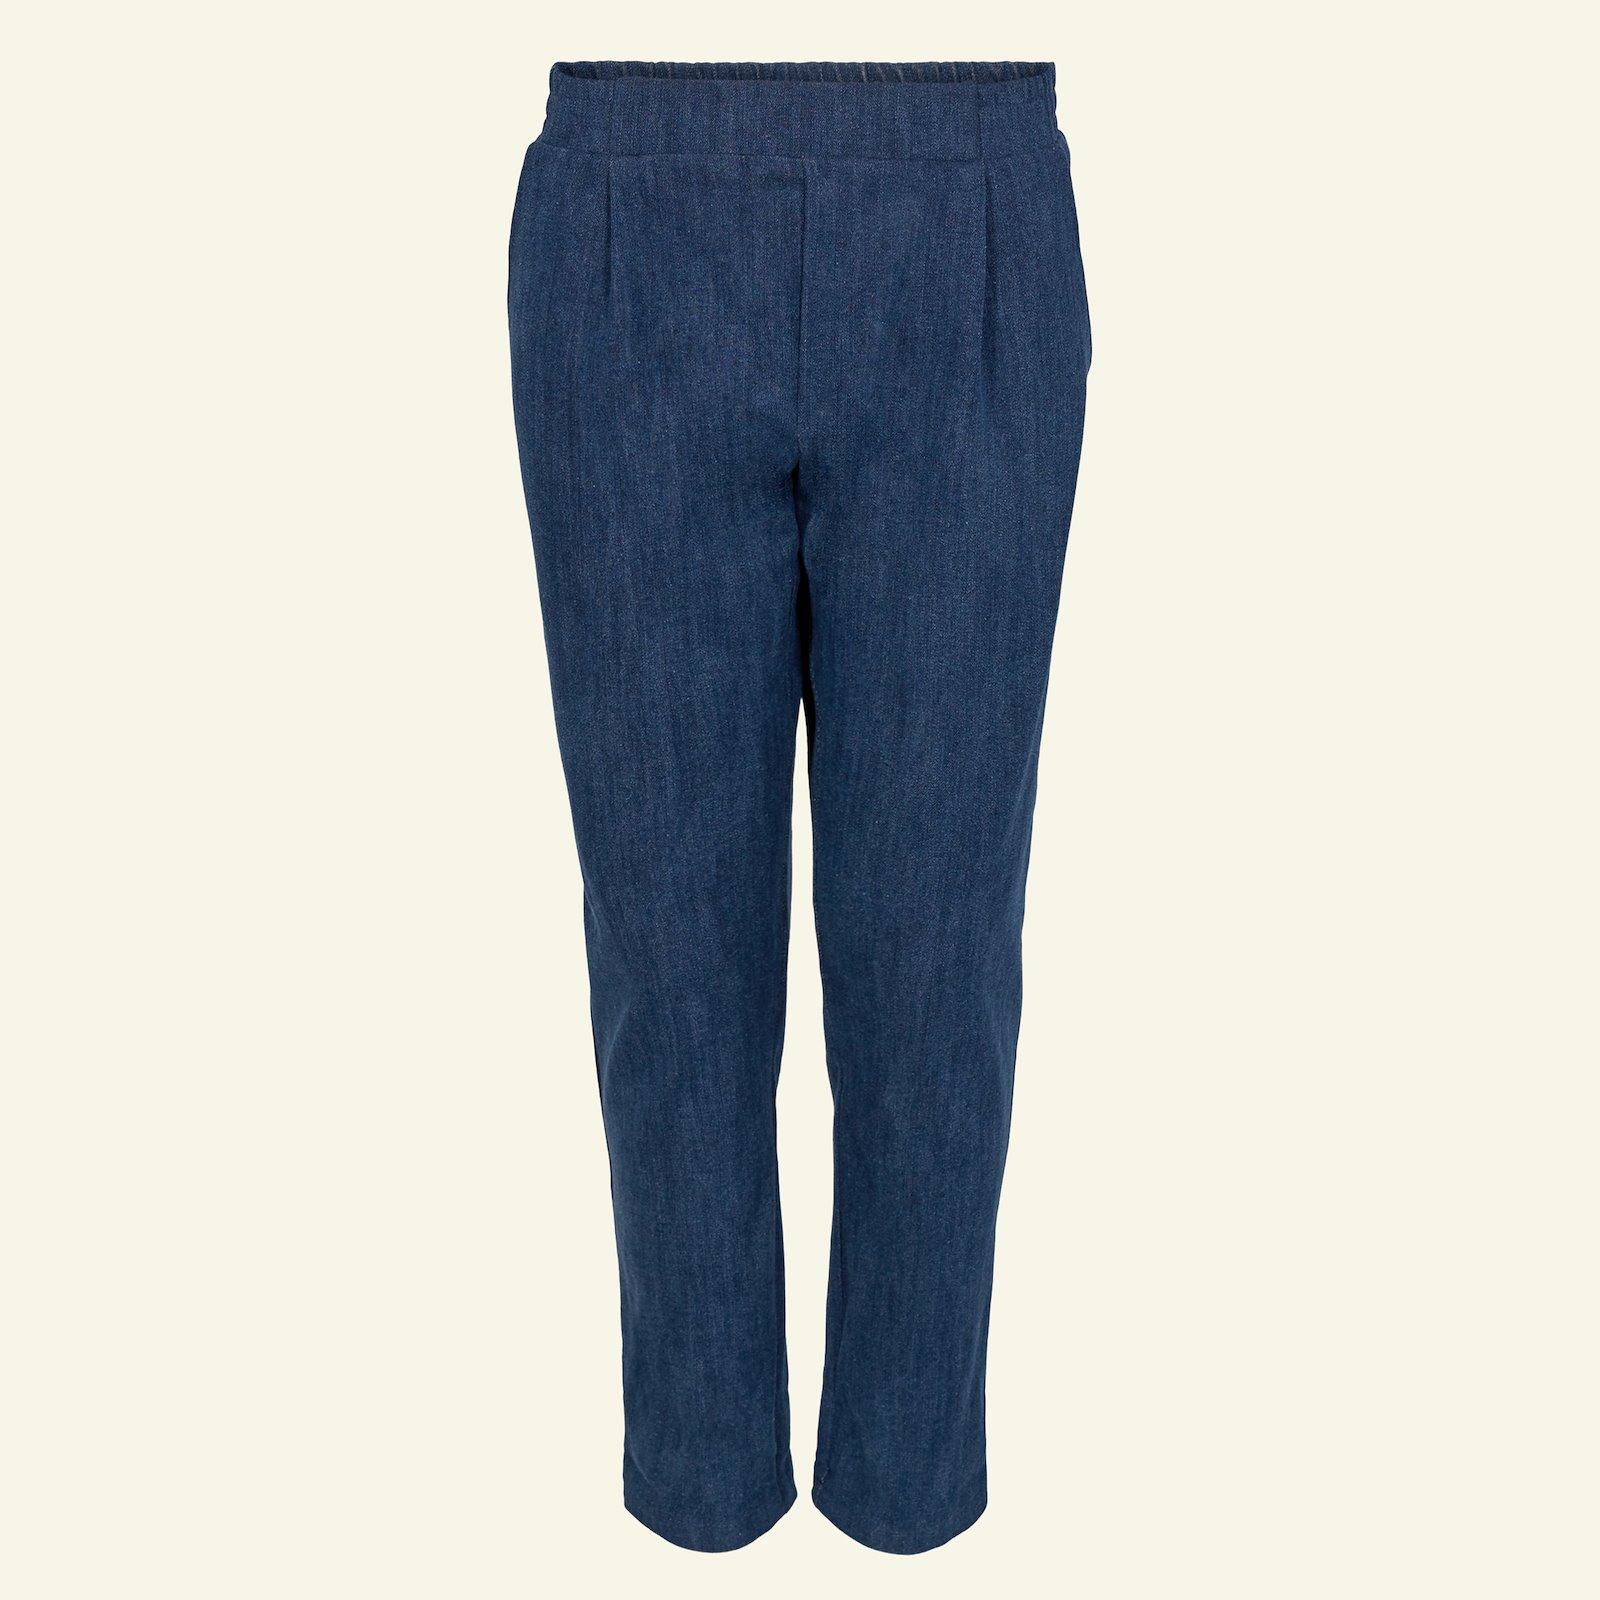 Chino pants, 98/3y p60033_460851_sskit